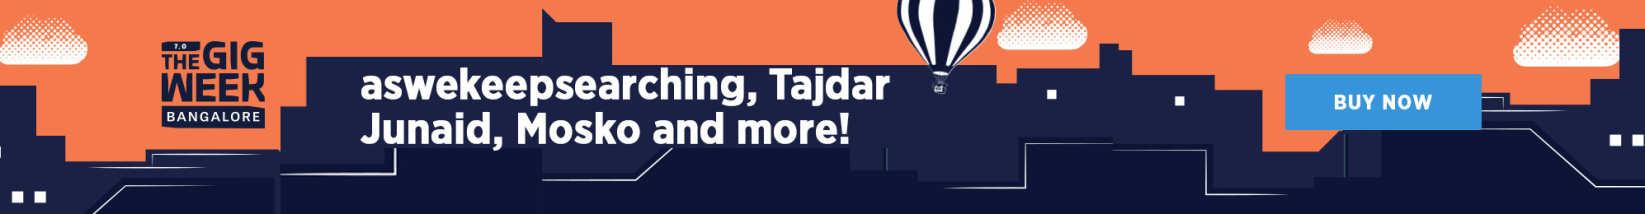 aswekeepsearching, Tajdar Junaid, Mosko and more!